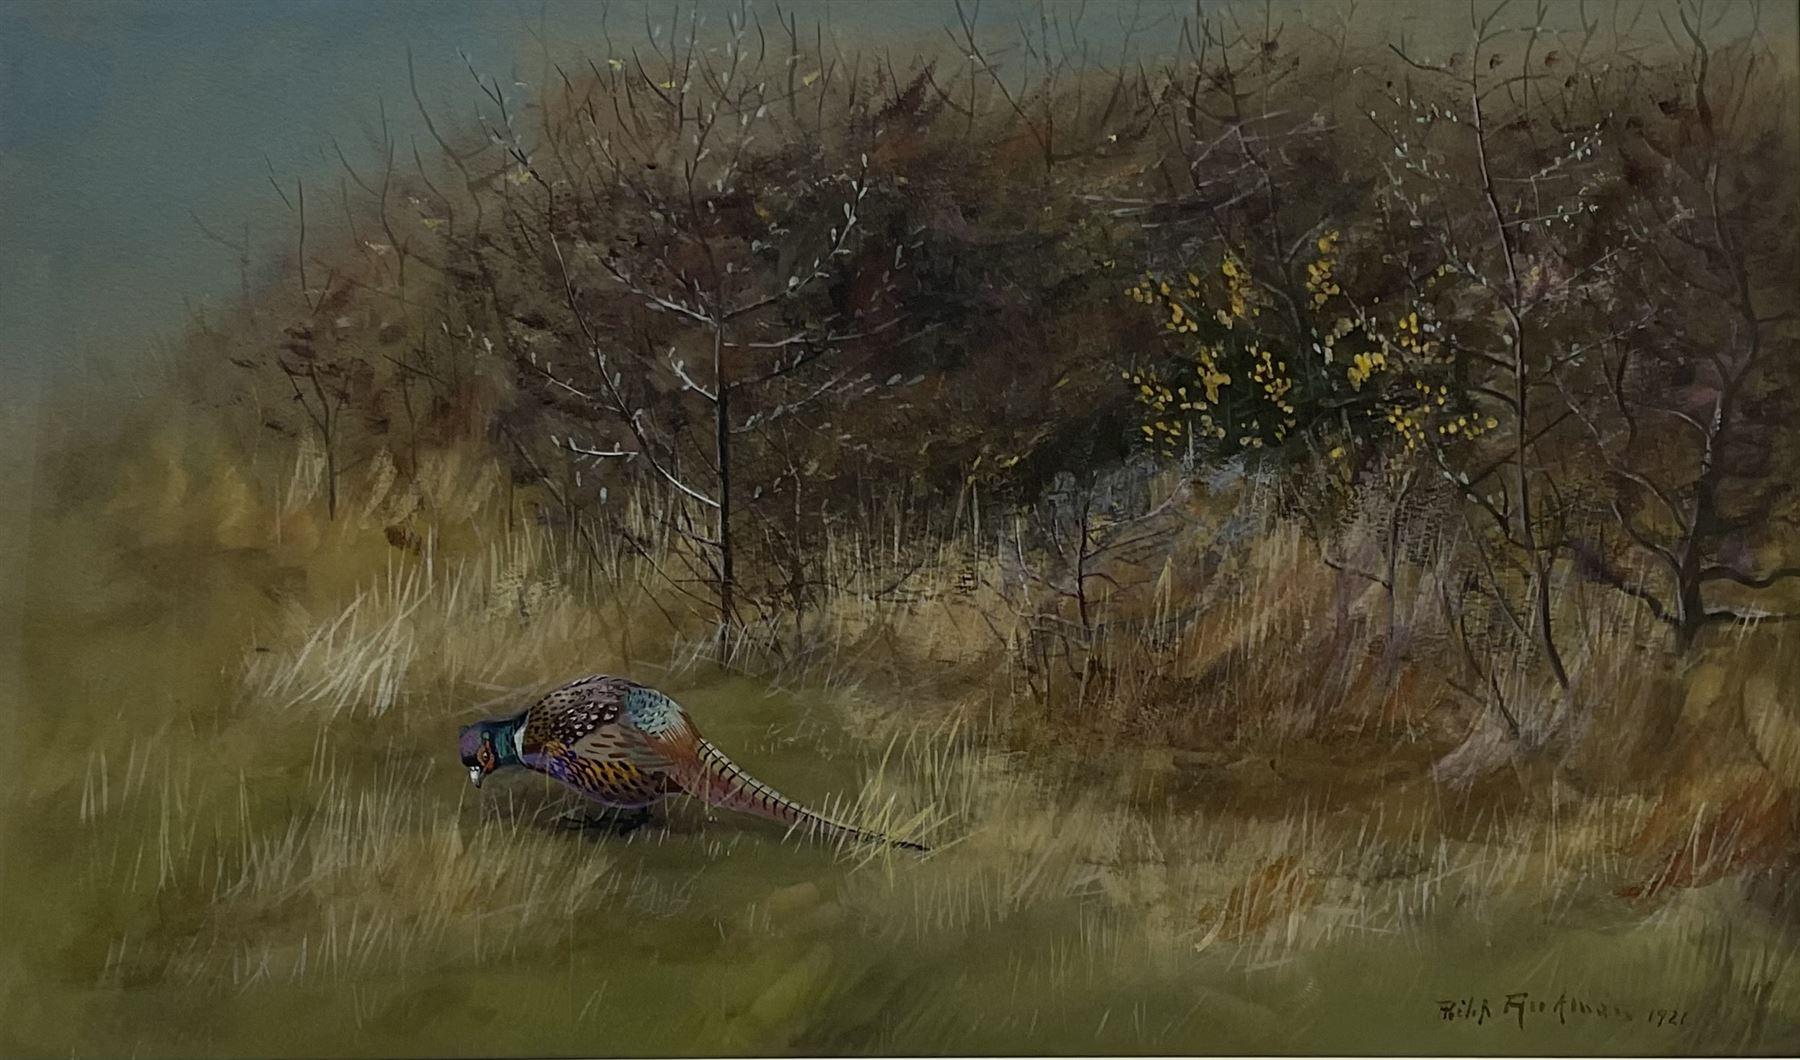 Philip Rickman (British 1891-1982): Pheasant emerging from the Undergrowth